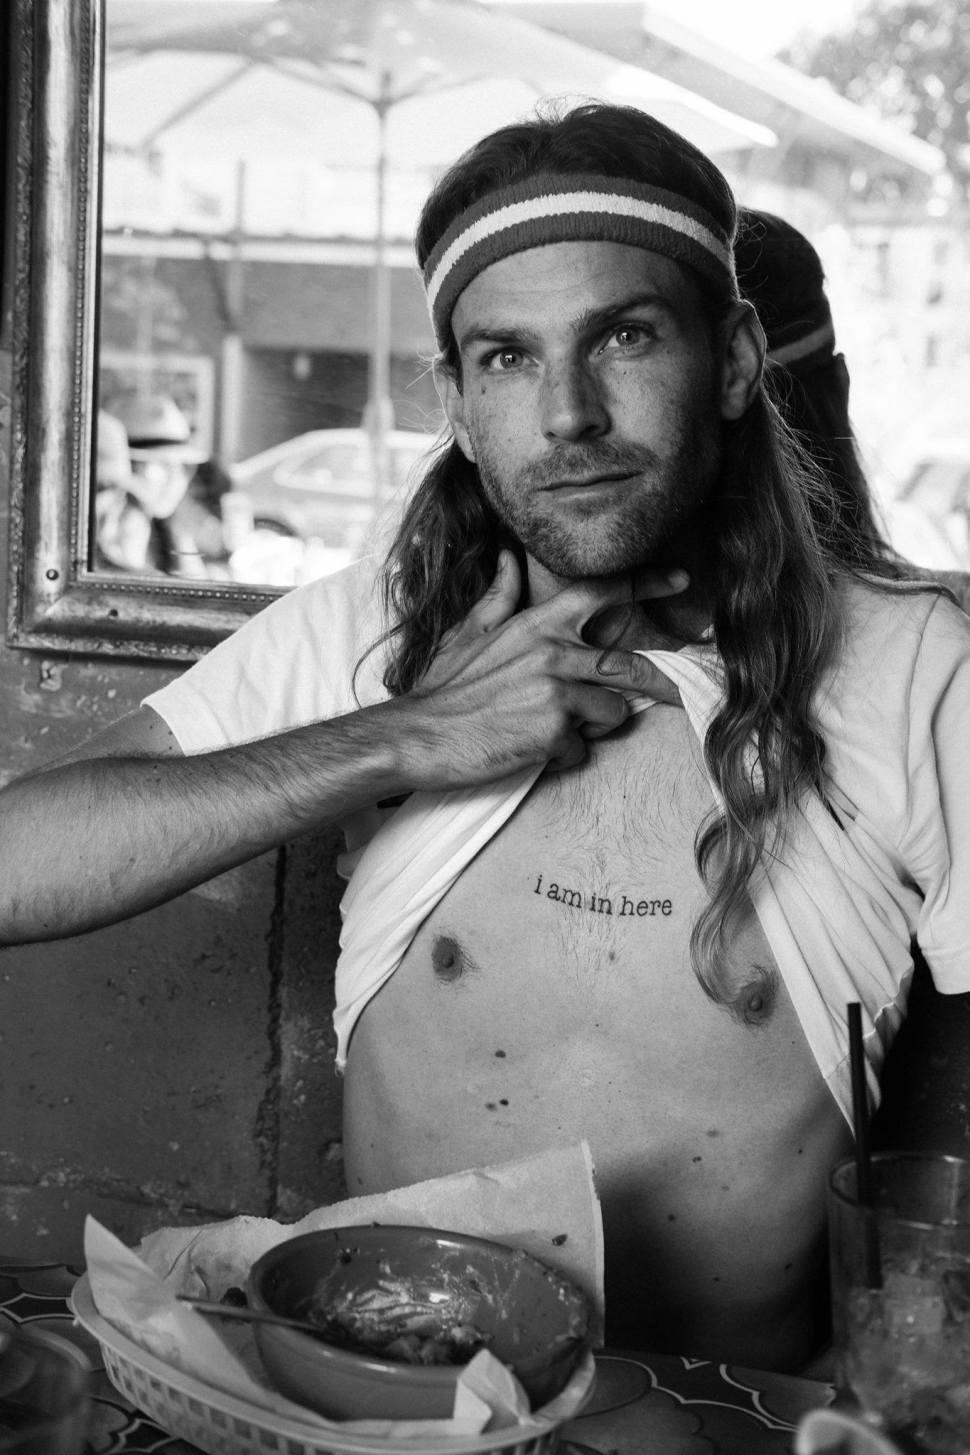 Ryan-ARC-Interview-Tattoo.jpg